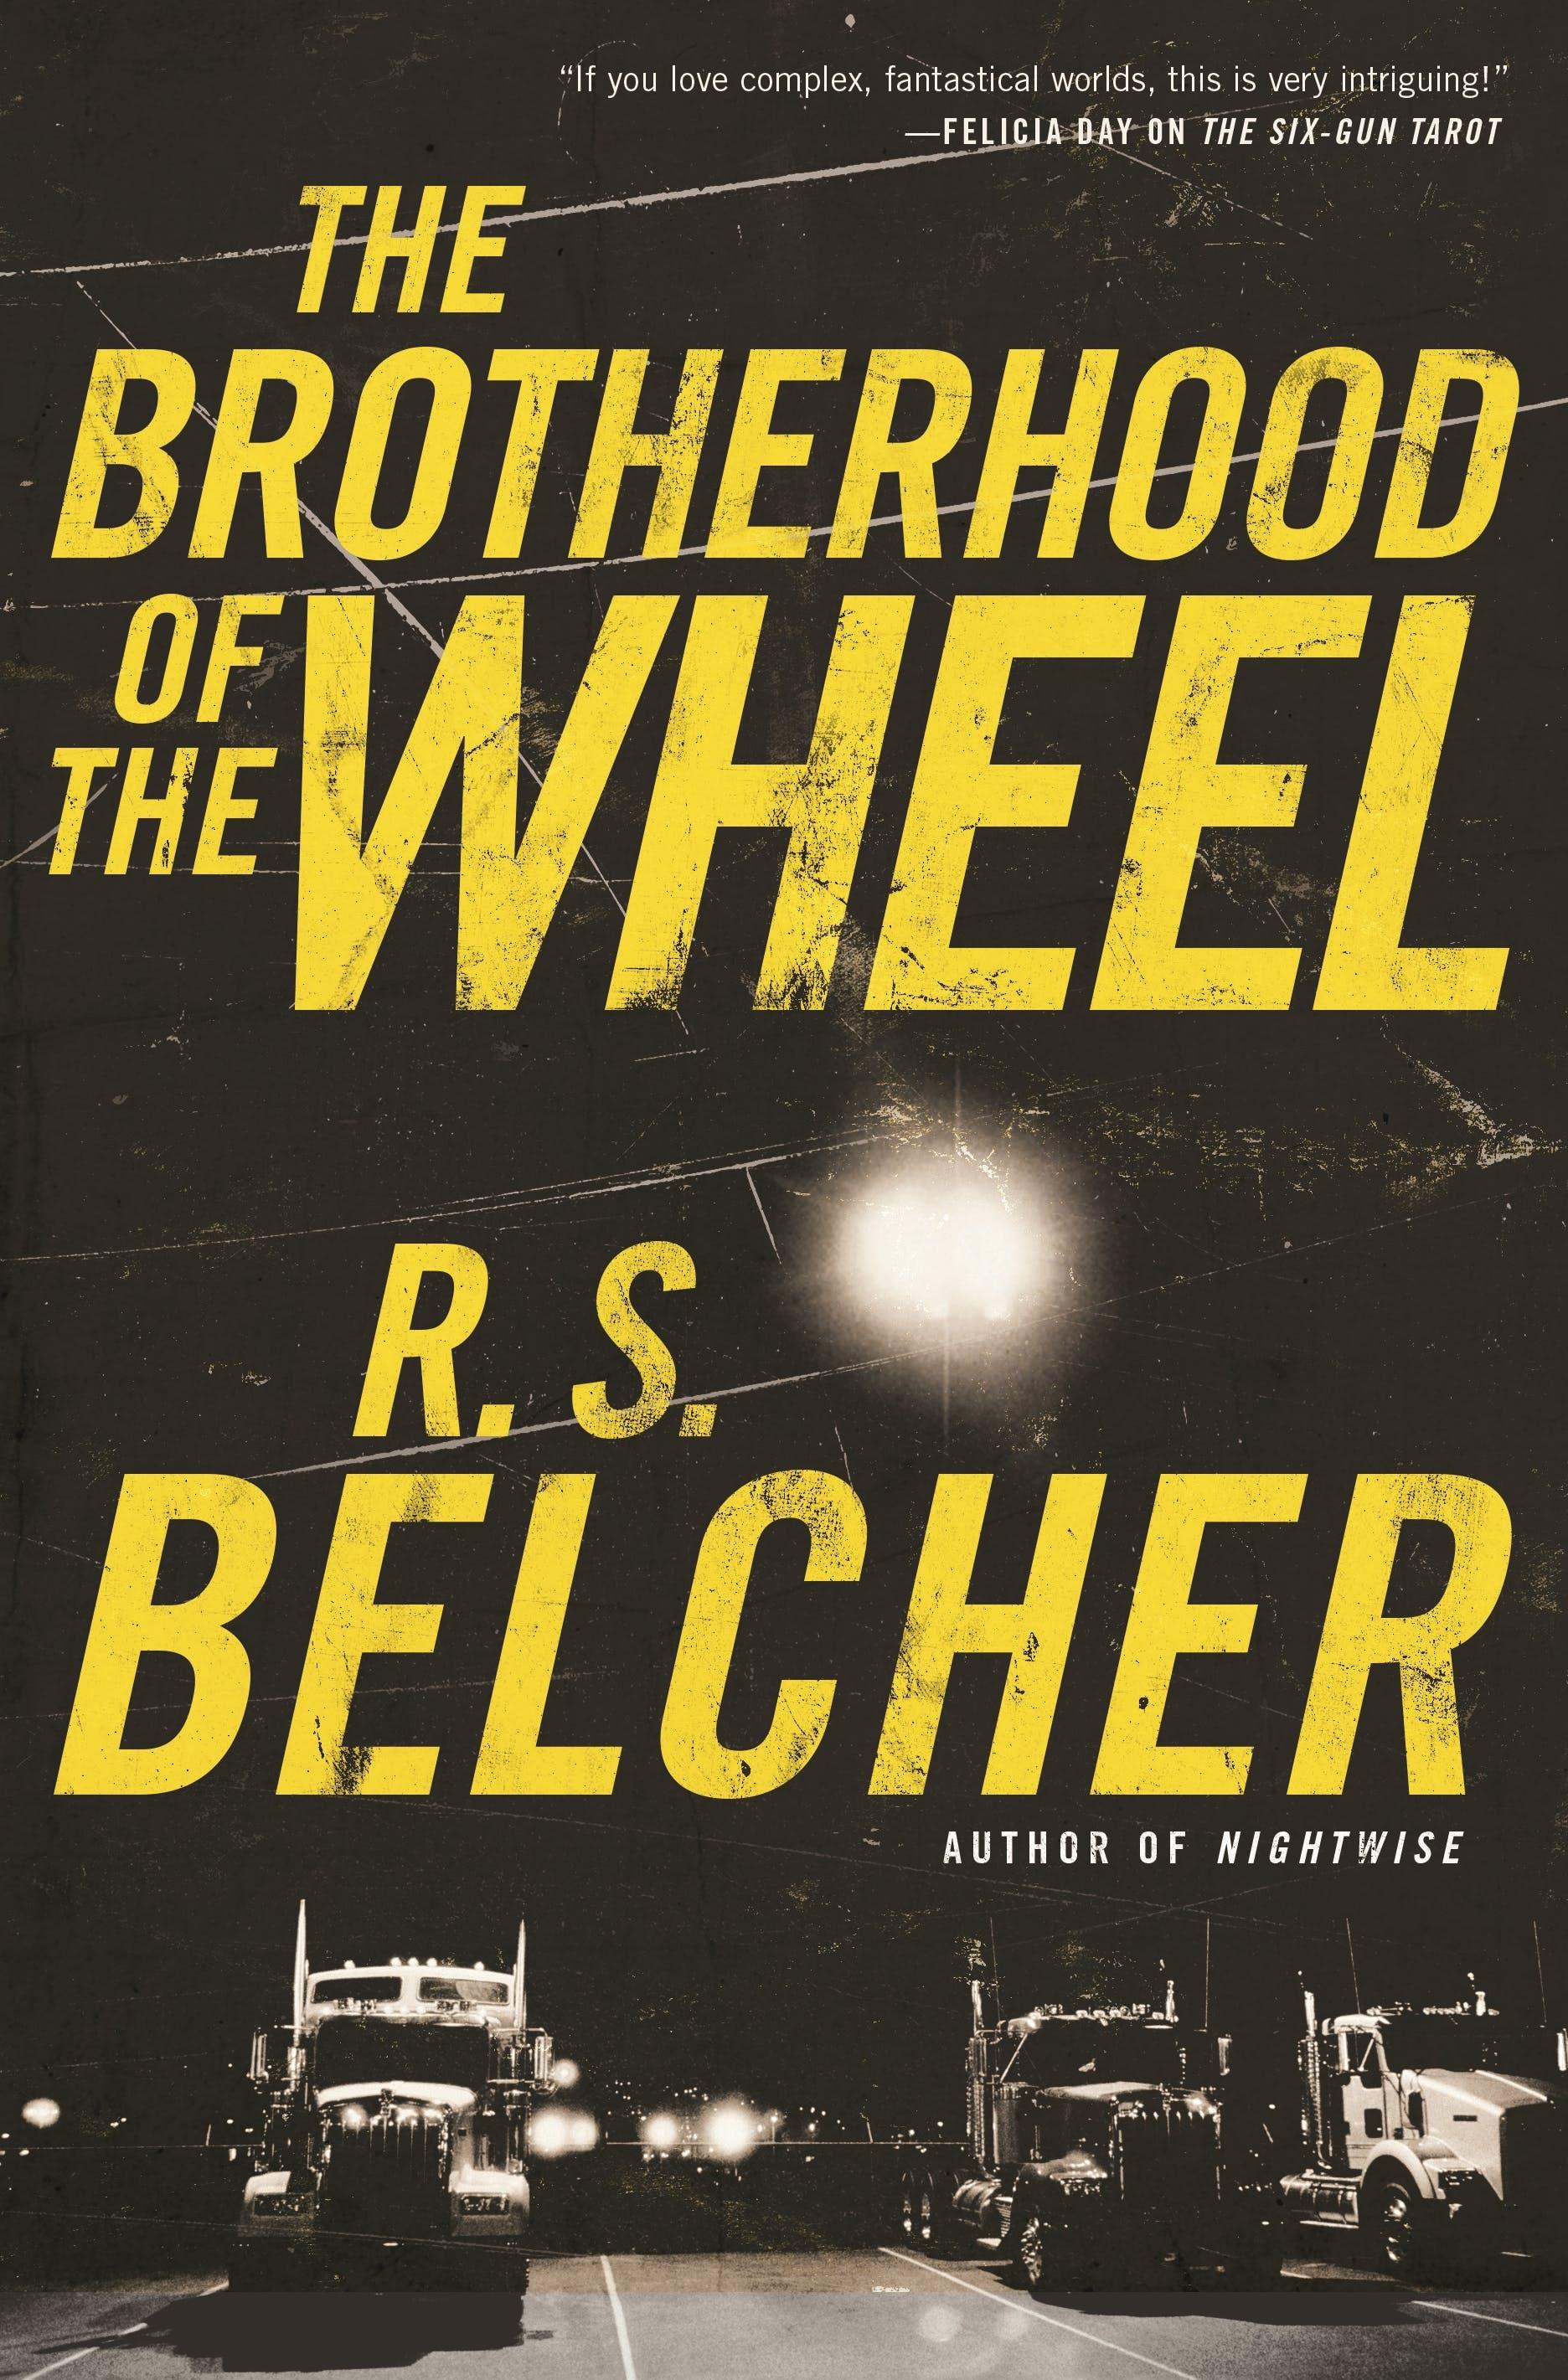 Image of The Brotherhood of the Wheel